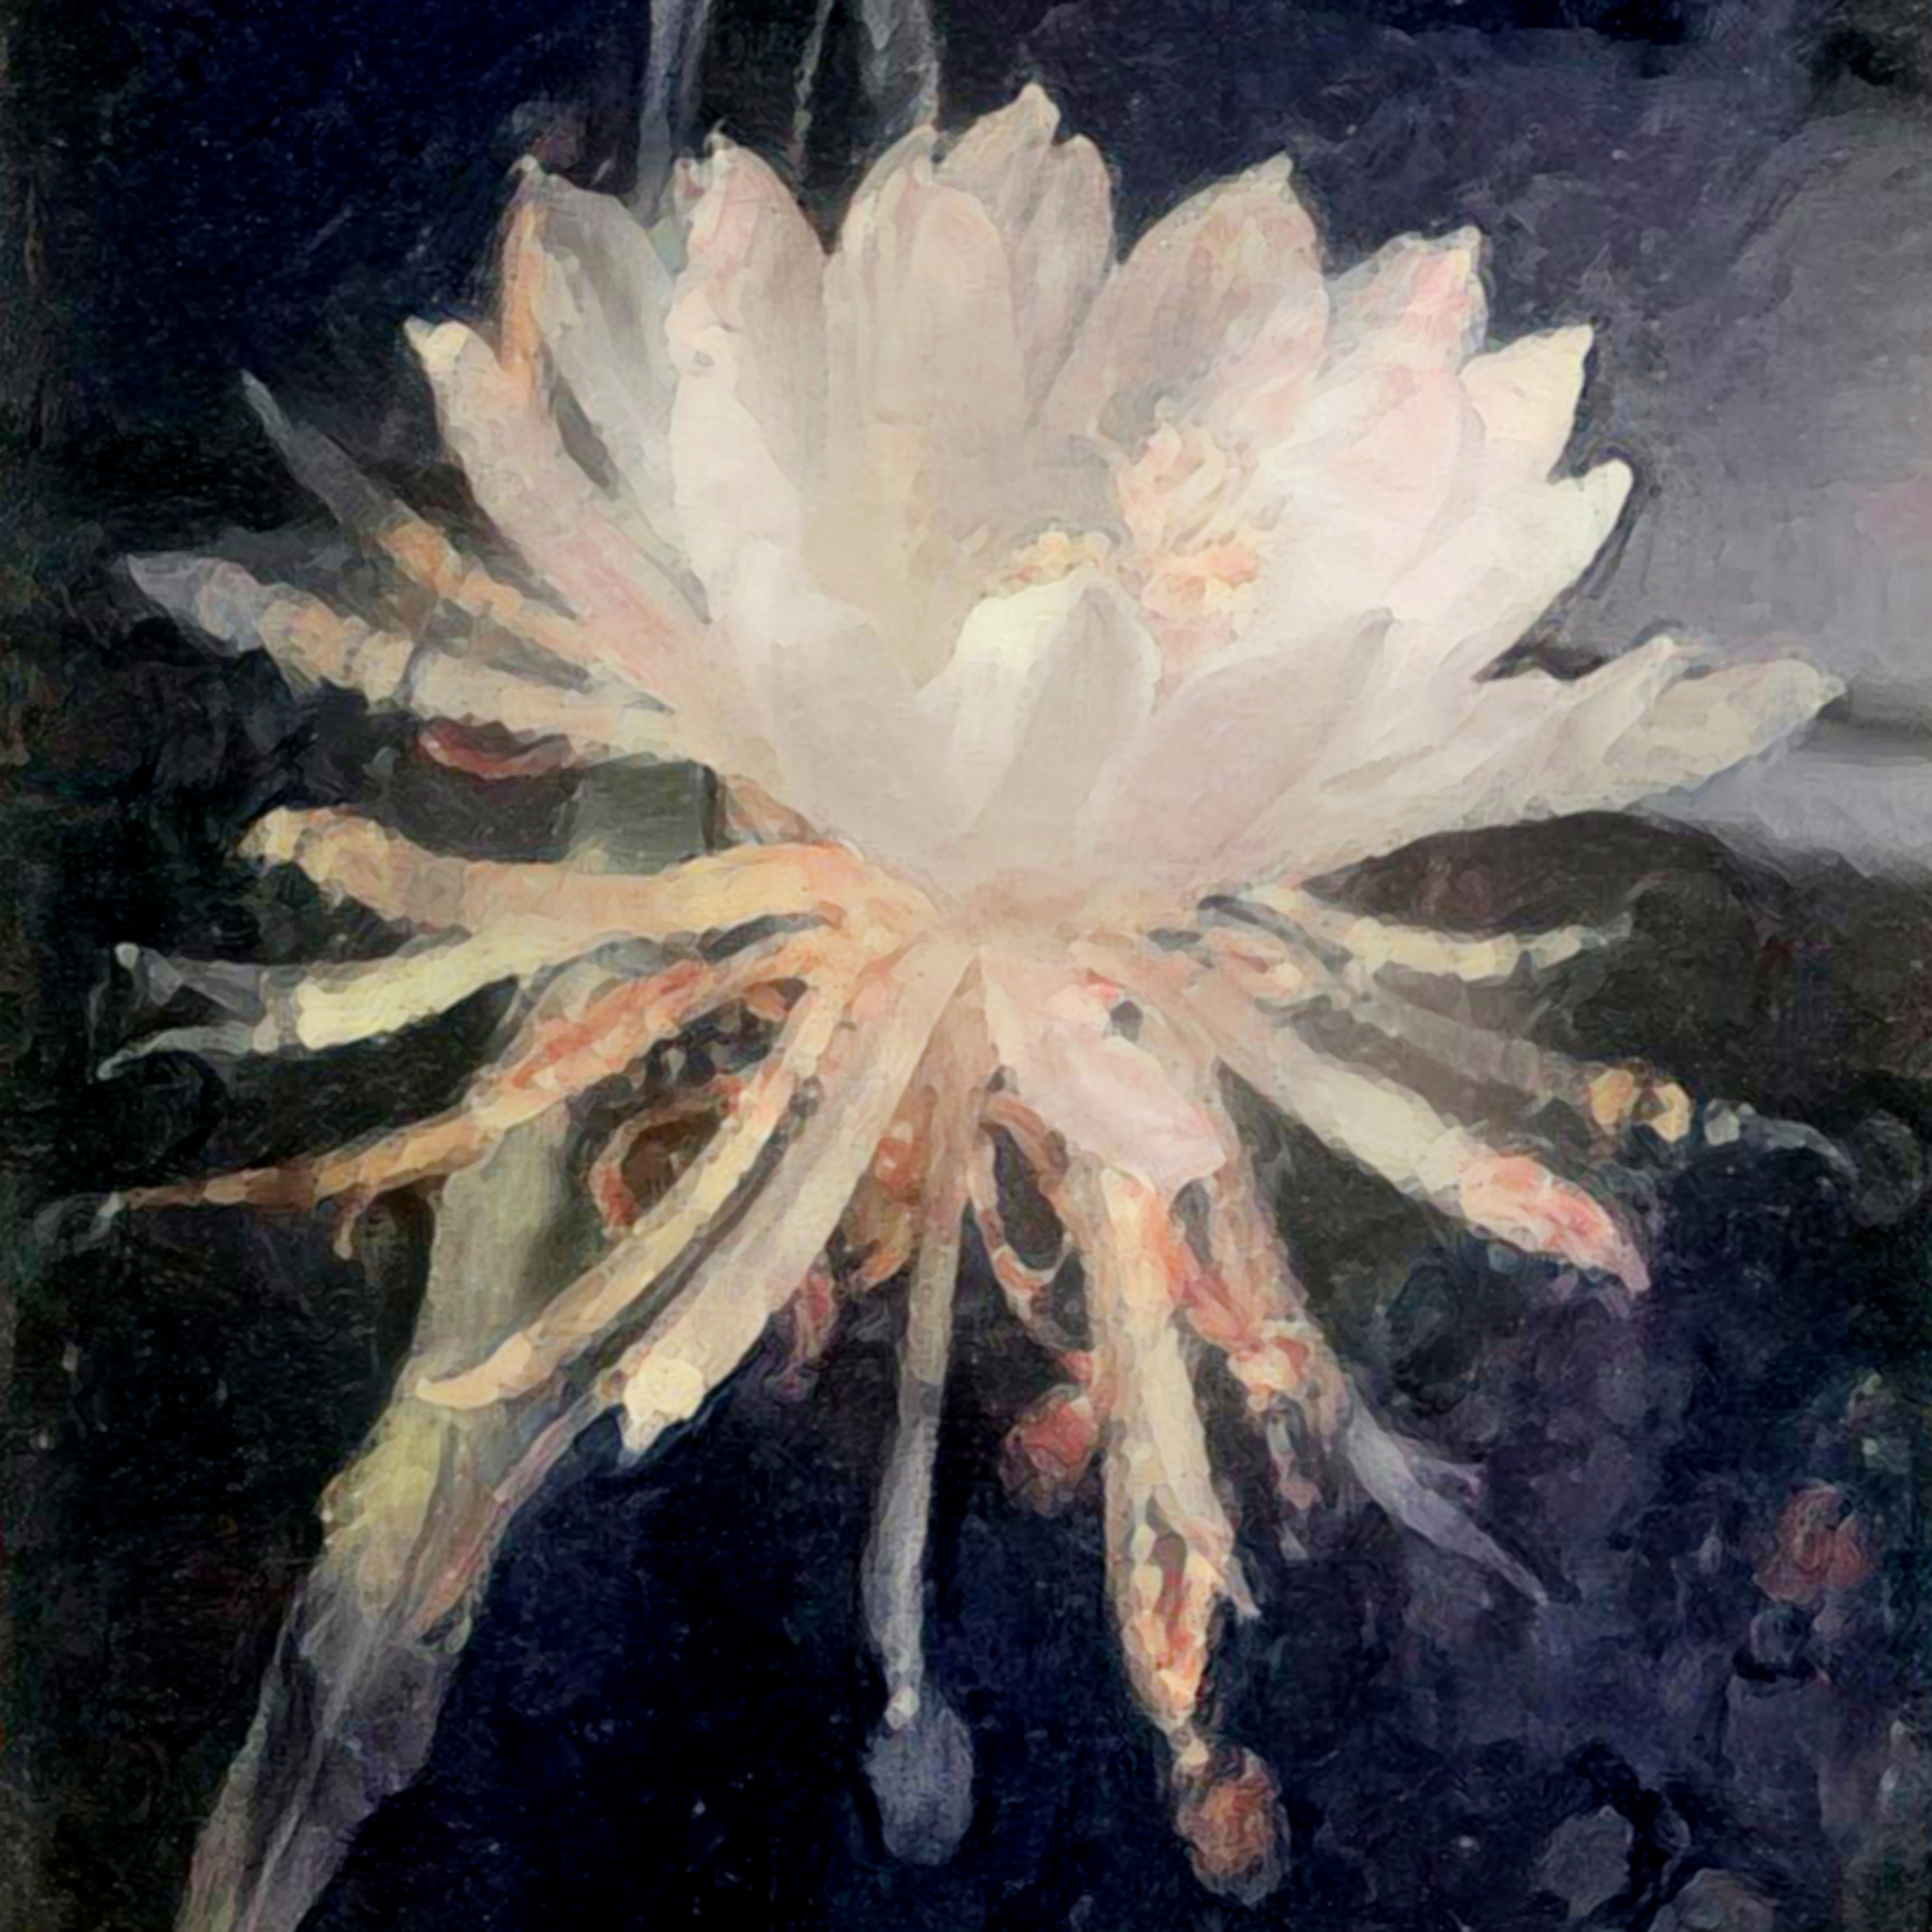 Epiphyllum pj9fwi